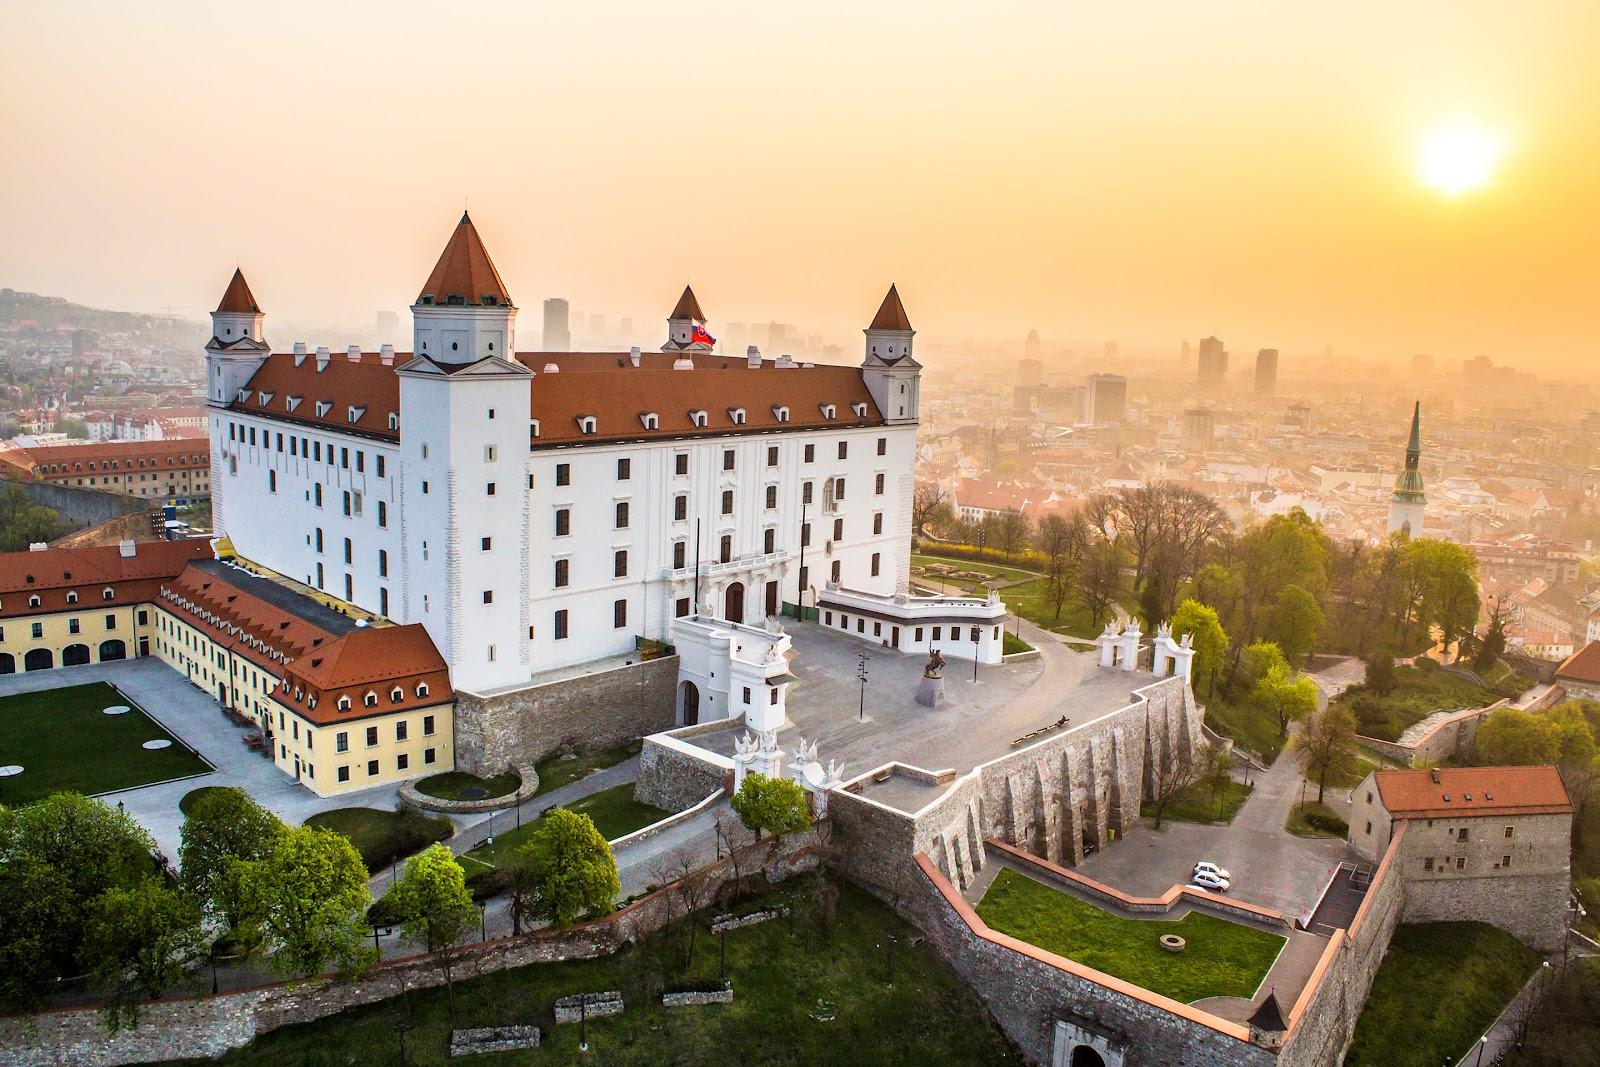 bratislava_castle_sunrise_copyright_duomedia.jpg